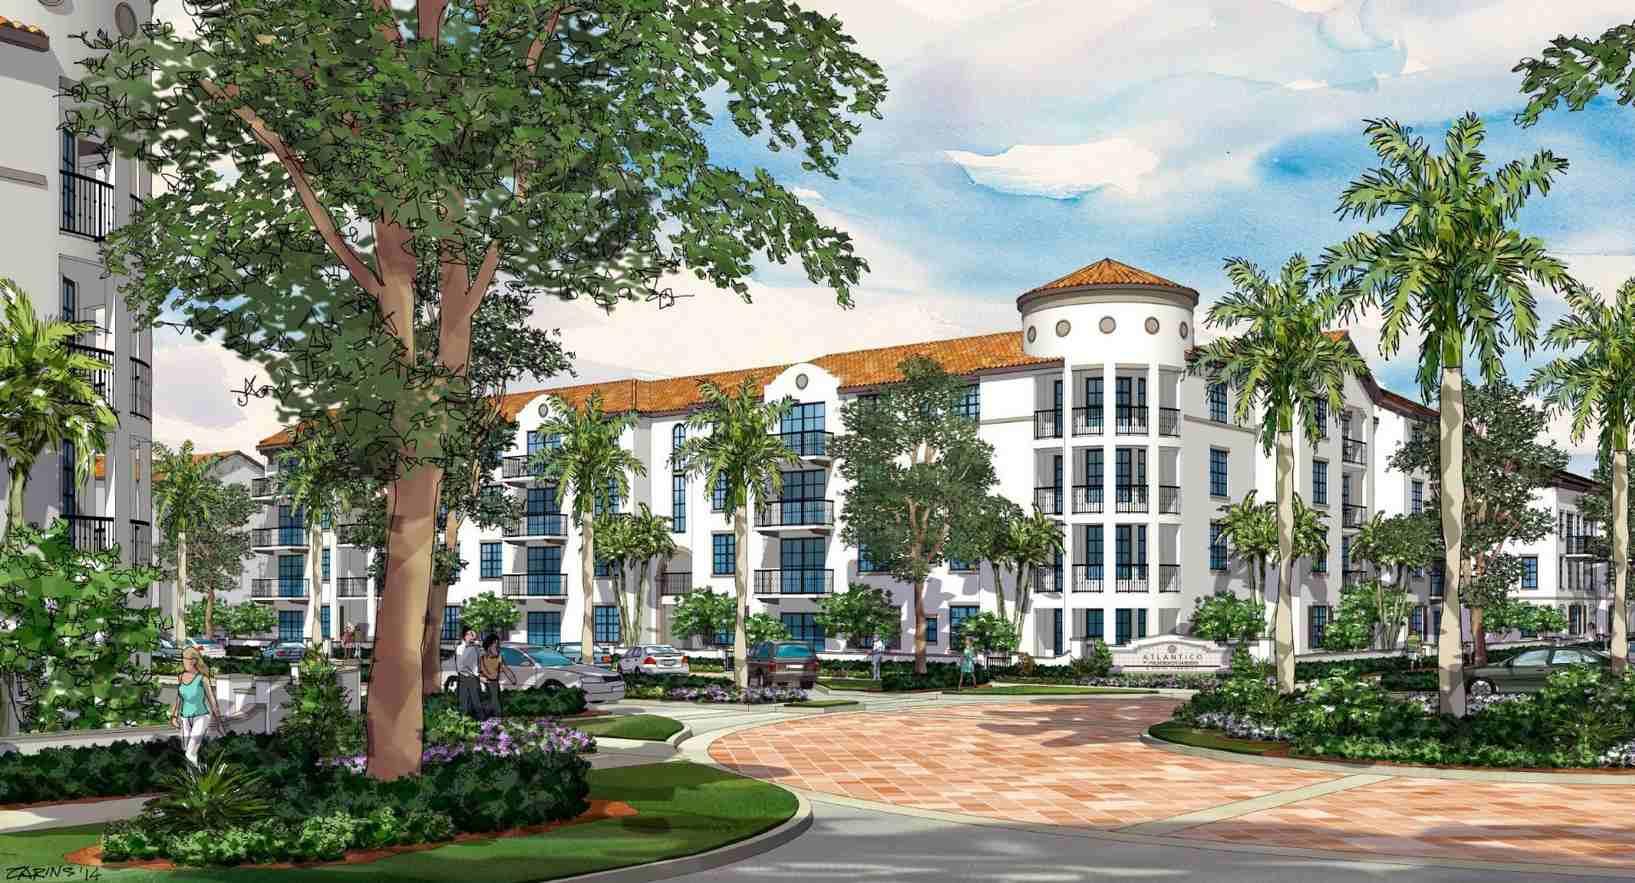 Atlantico at alton apartments in palm beach gardens fl - Palm beach gardens property appraiser ...